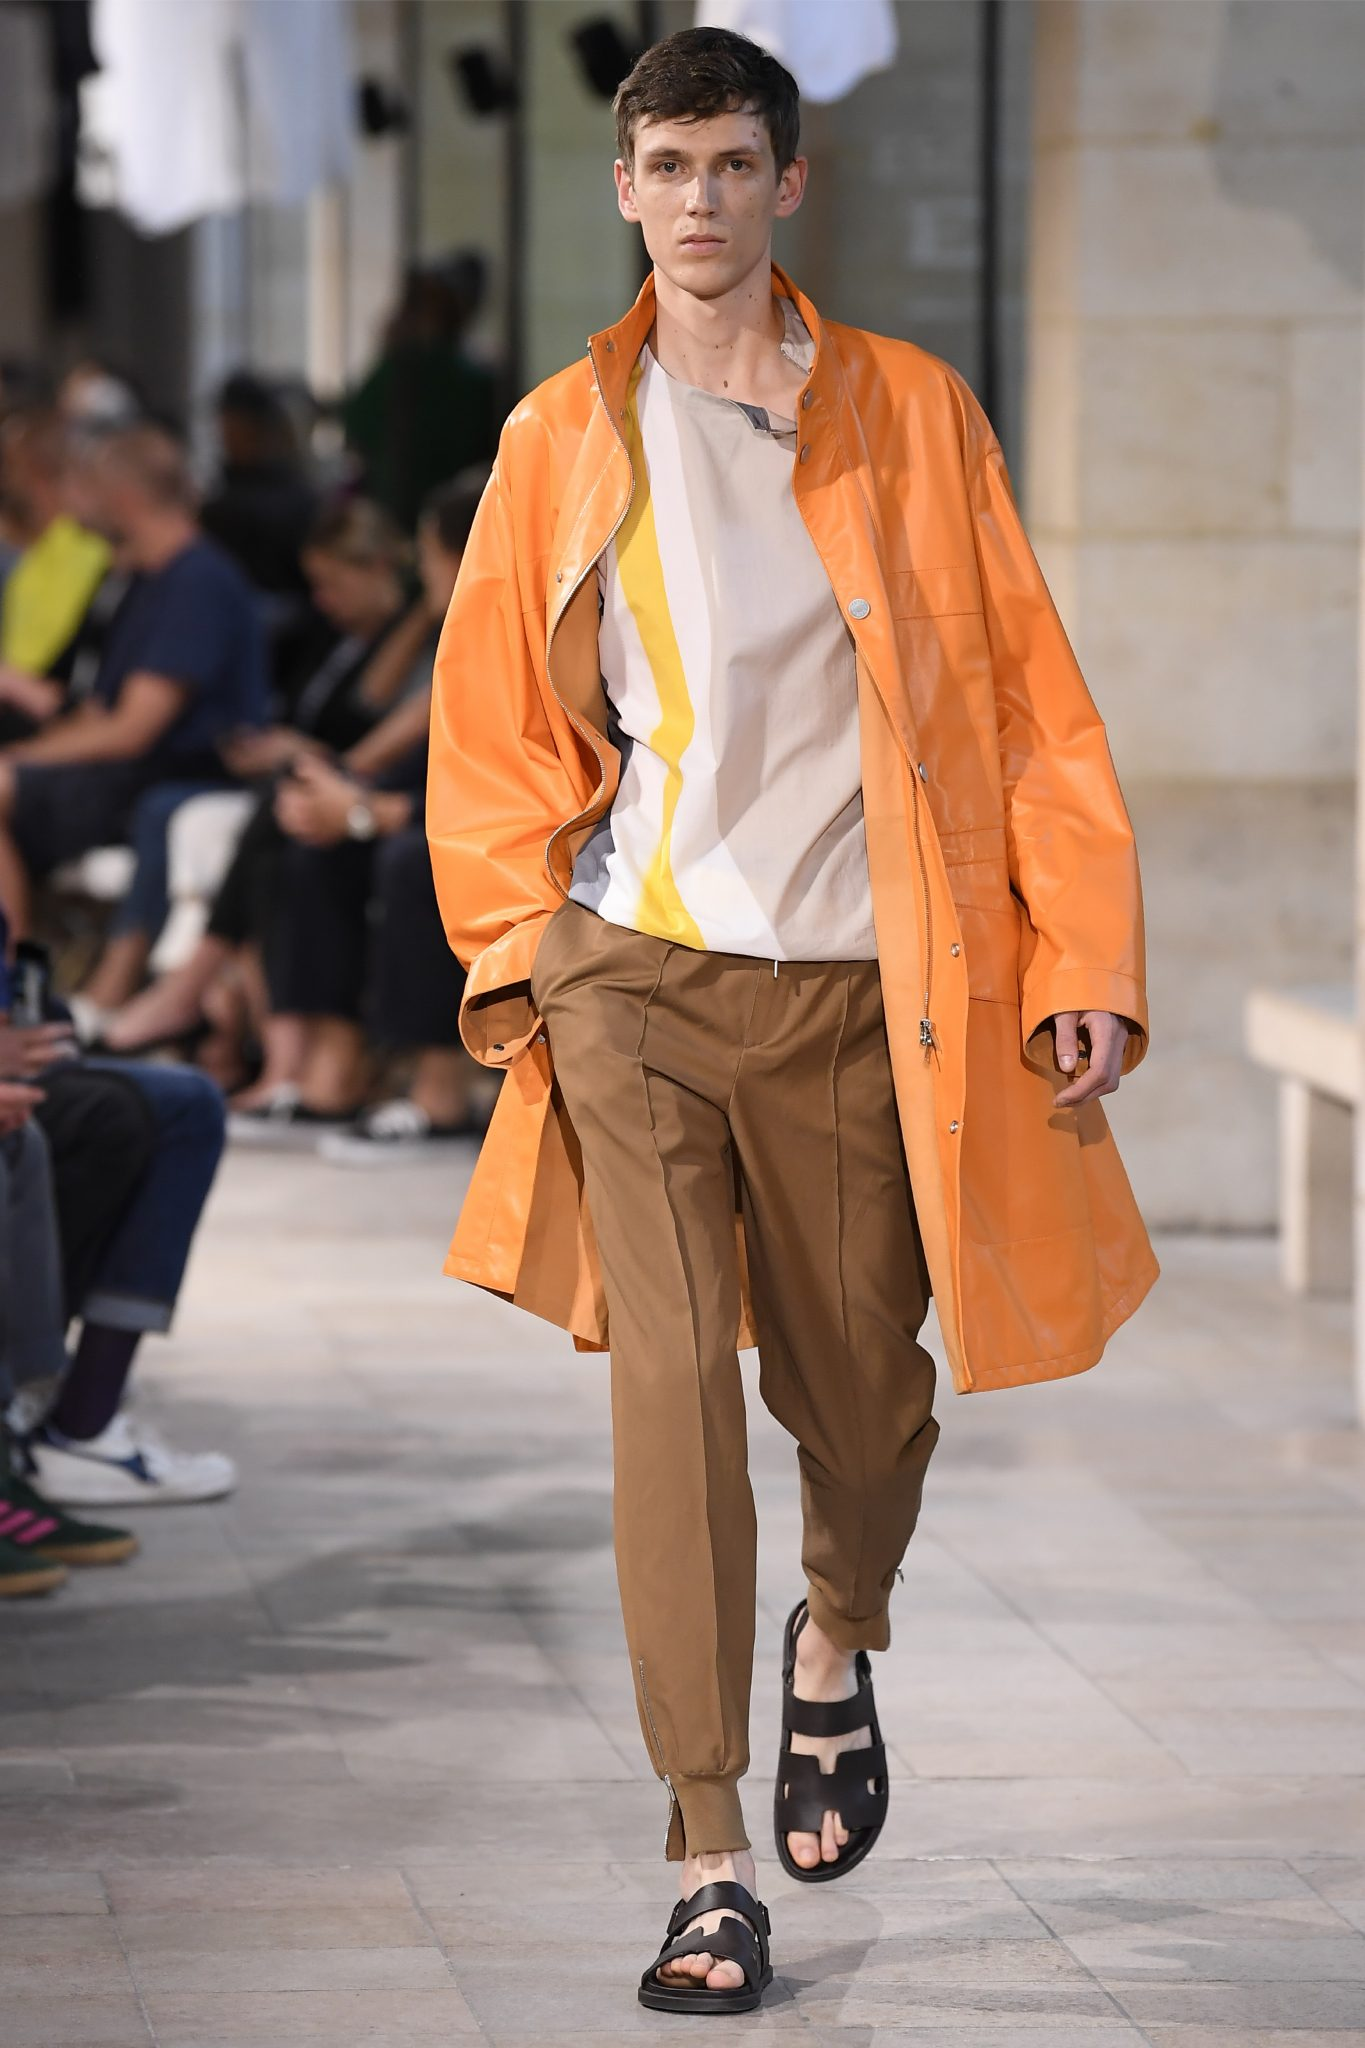 51a9c8ad27954 Hermès Men's Ready to Wear Summer 2019   Mosaic